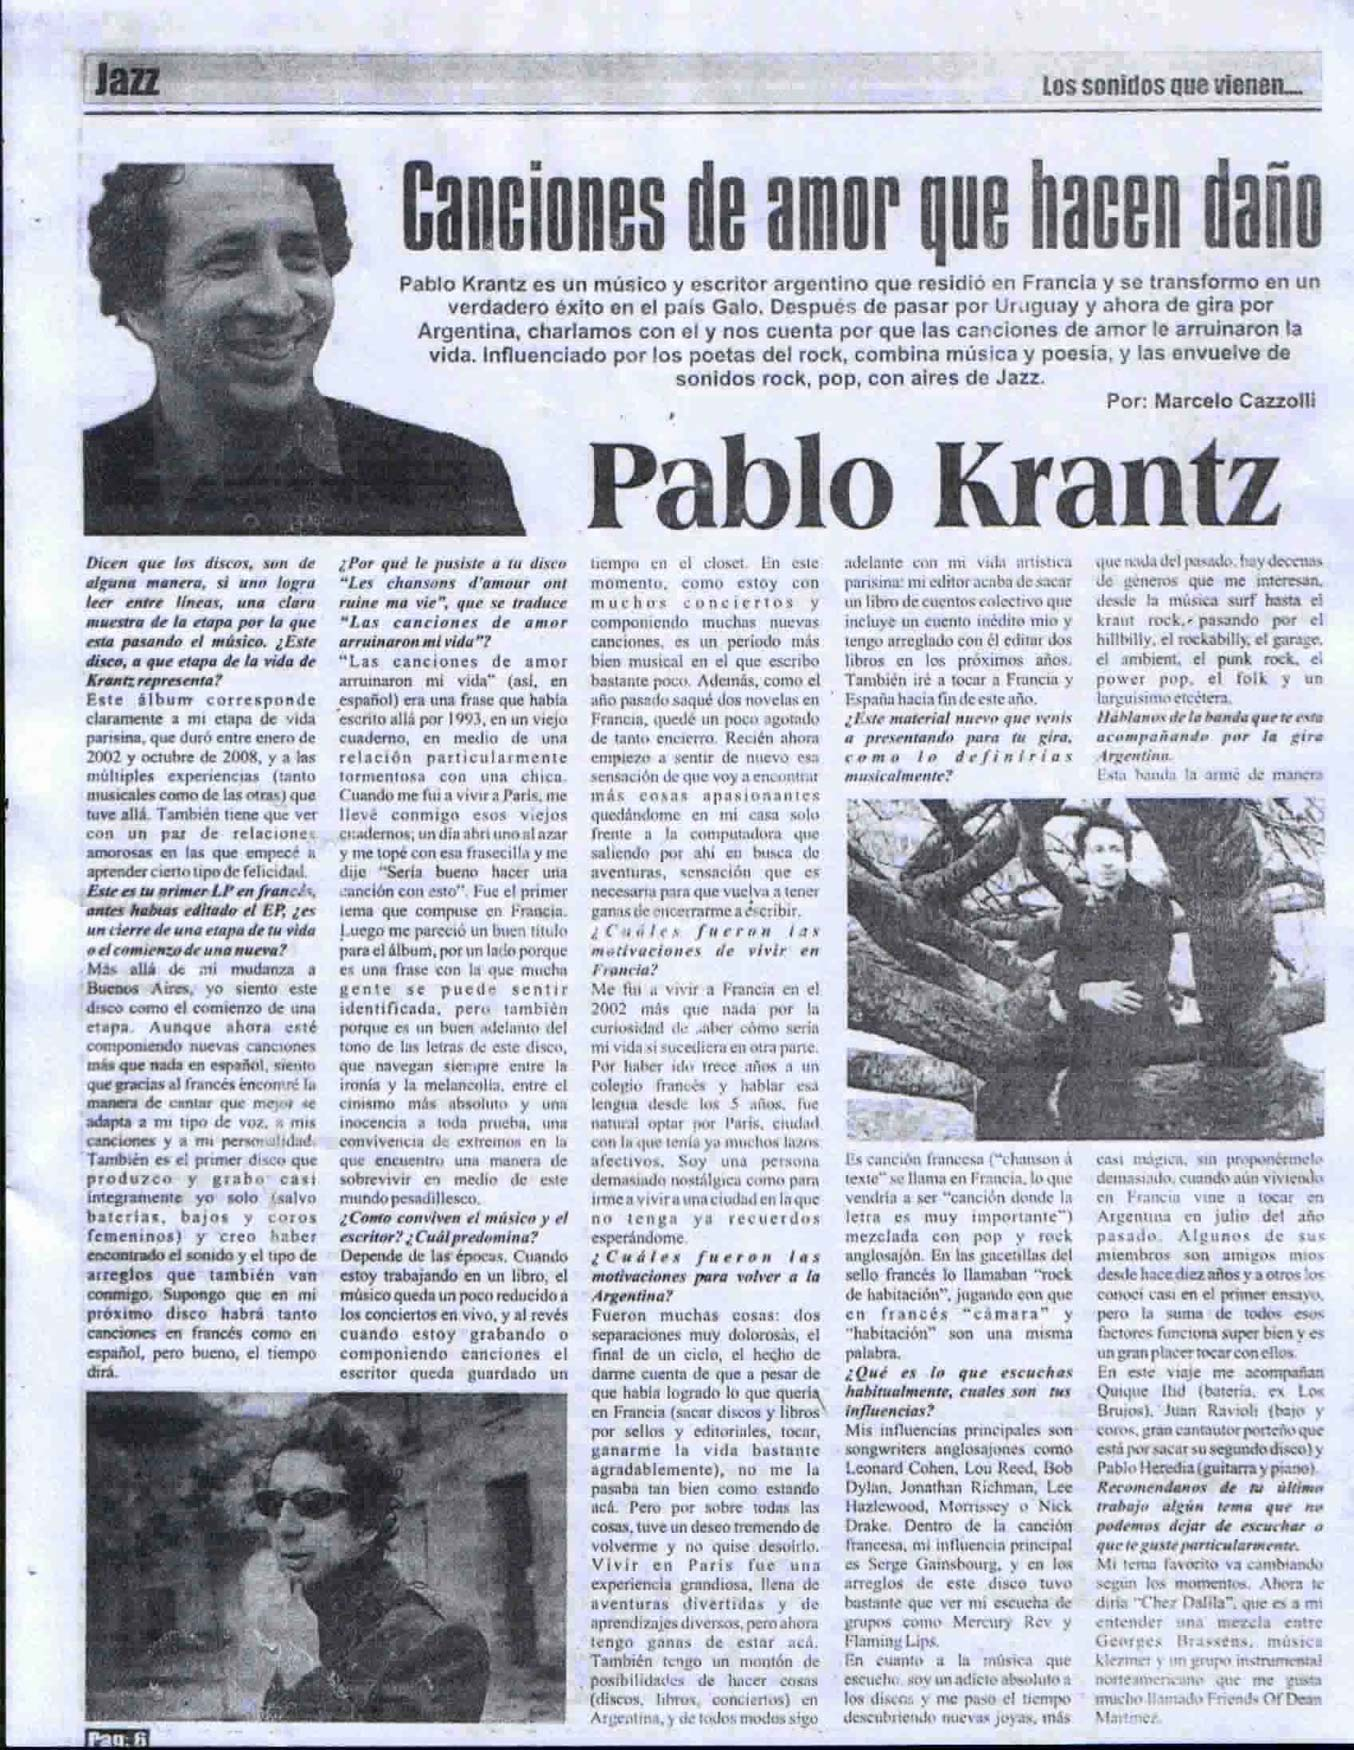 Diario La Republica, Uruguay, 2008